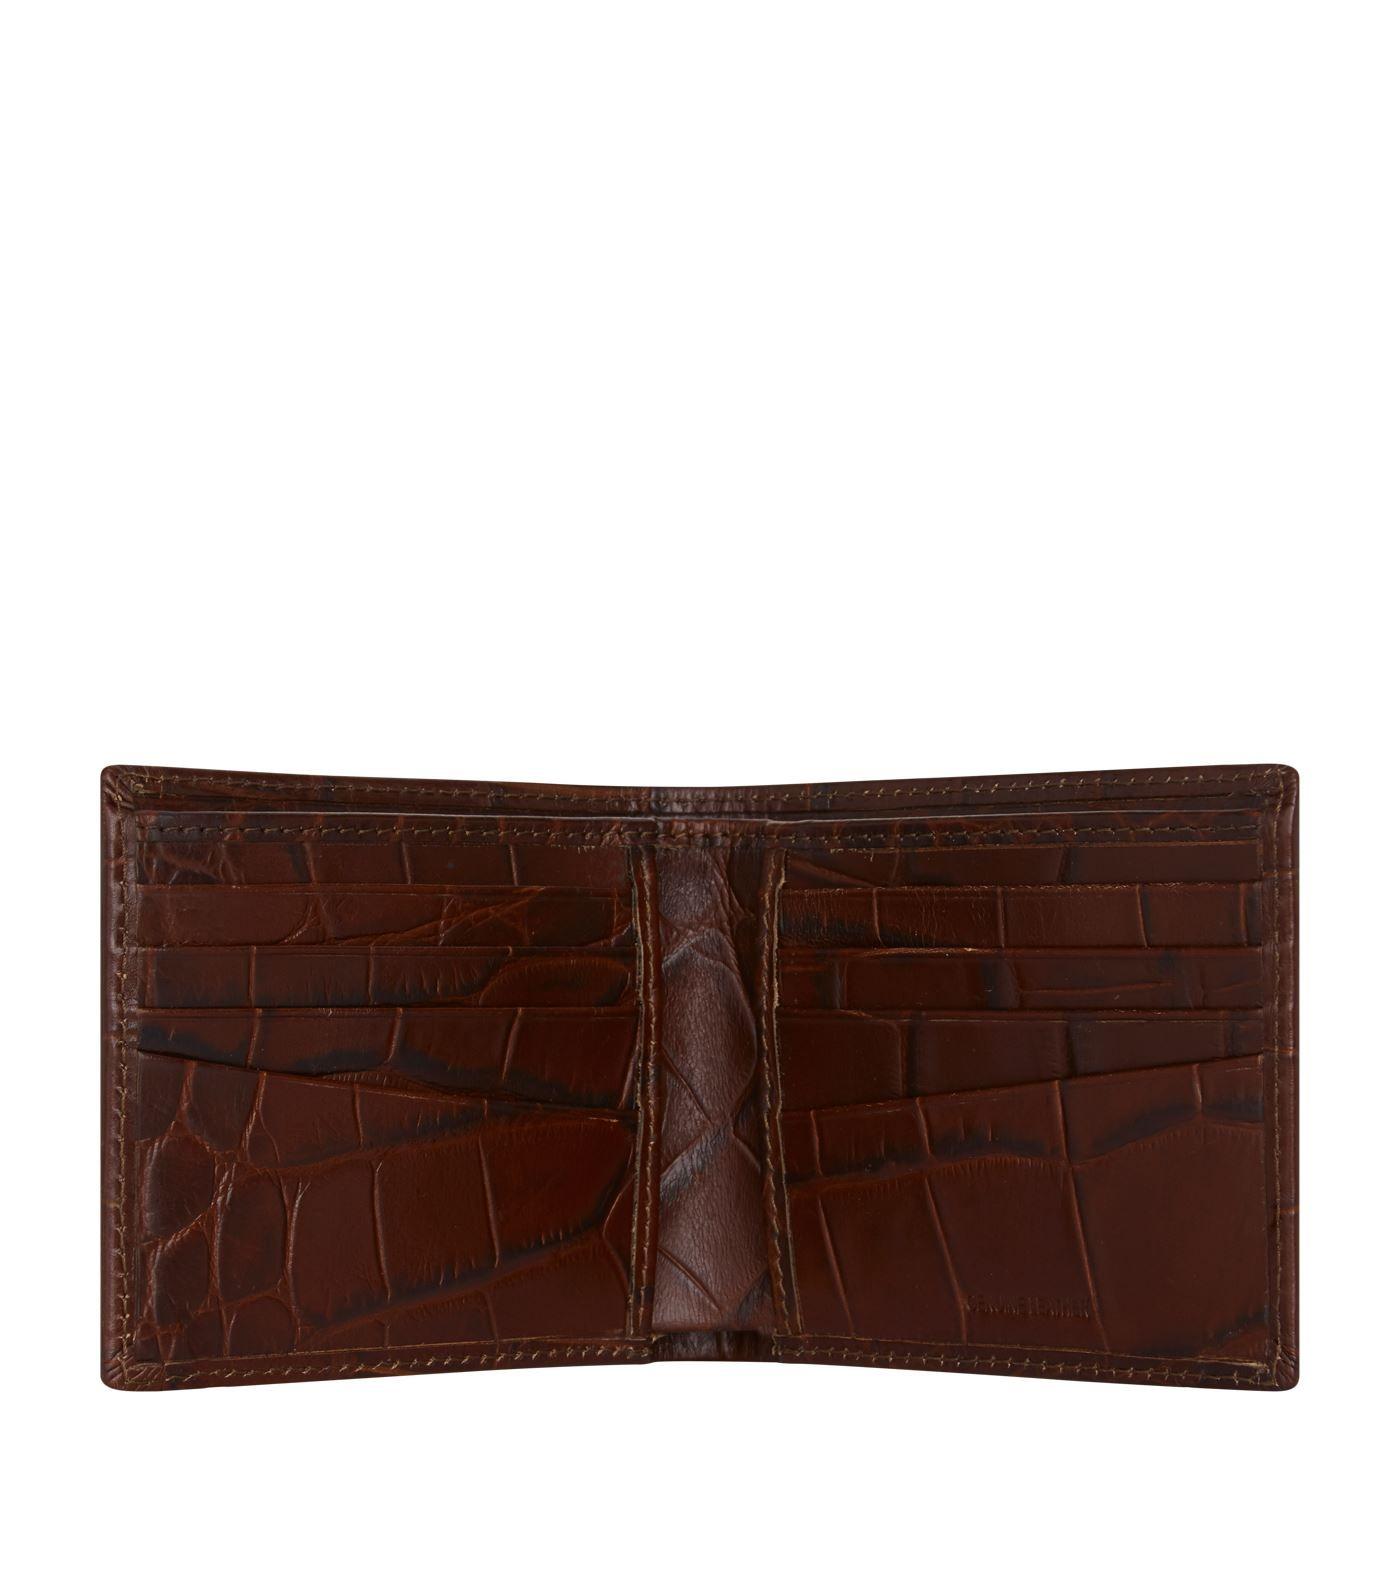 Harrods Crocodile Embossed Leather Bilfold Wallet Ad Sponsored Embossed Crocodile Harrods Wallet Bilfold Embossed Leather Wallet Leather